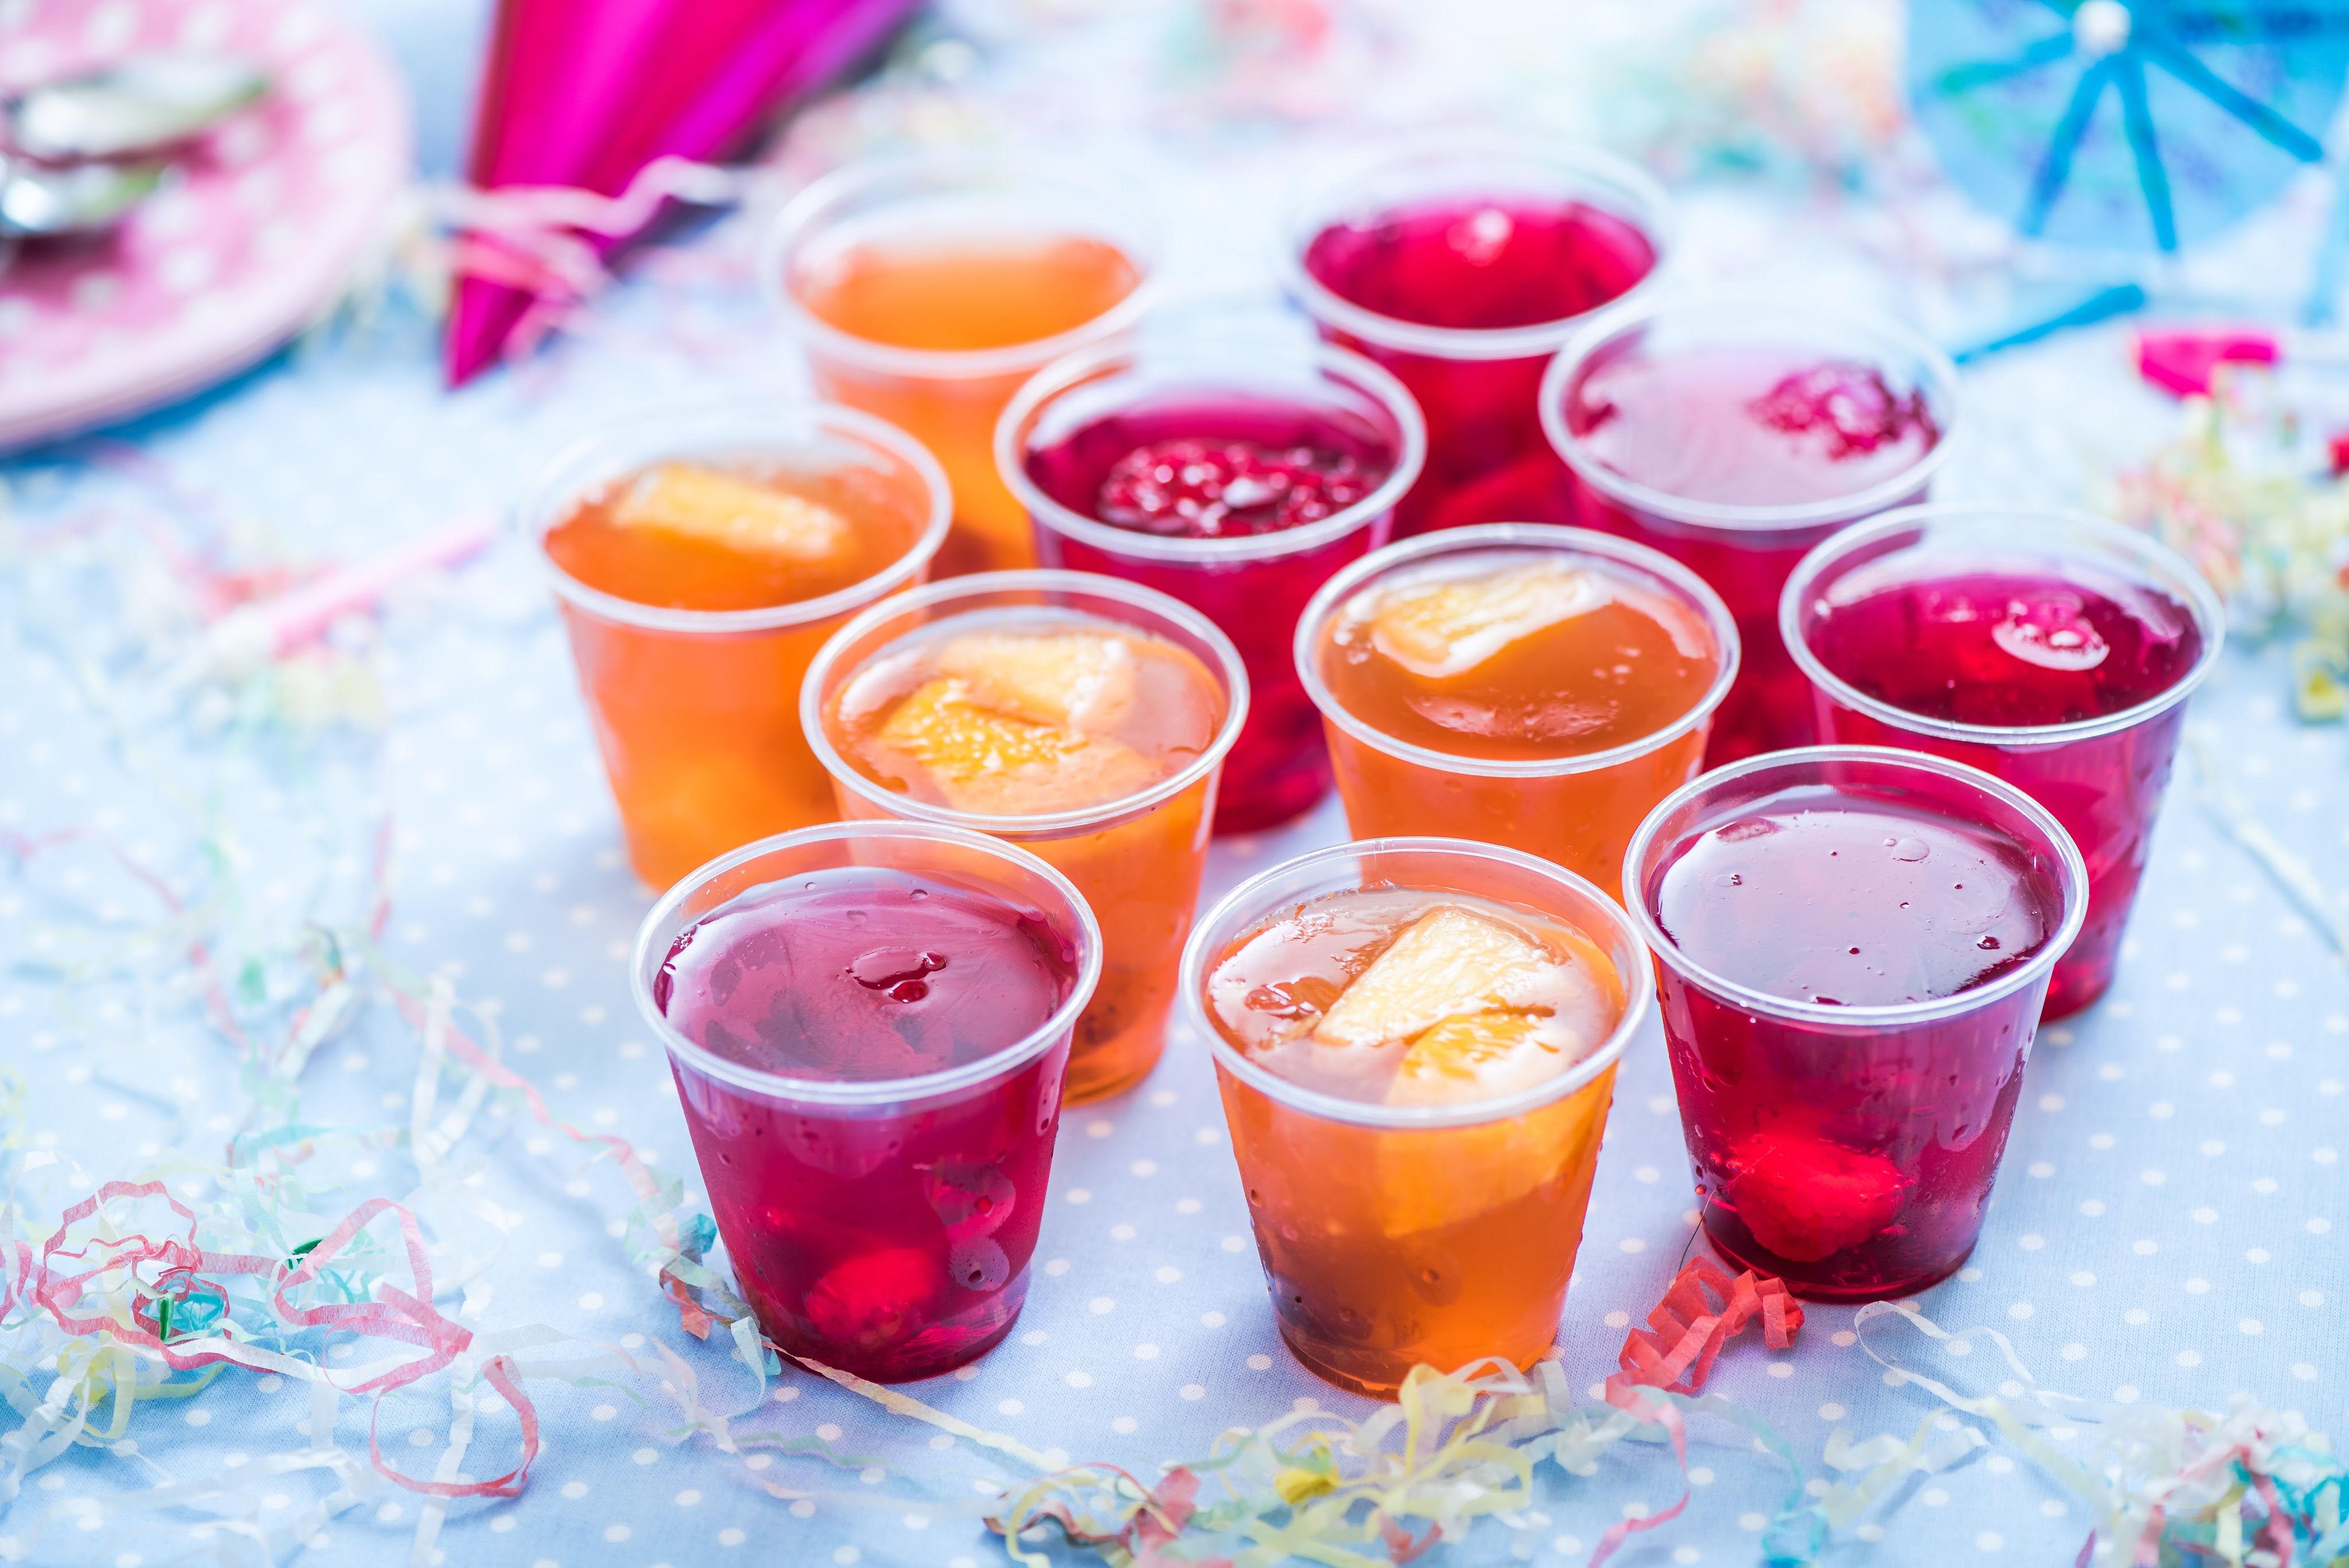 jello-for-birthday-party